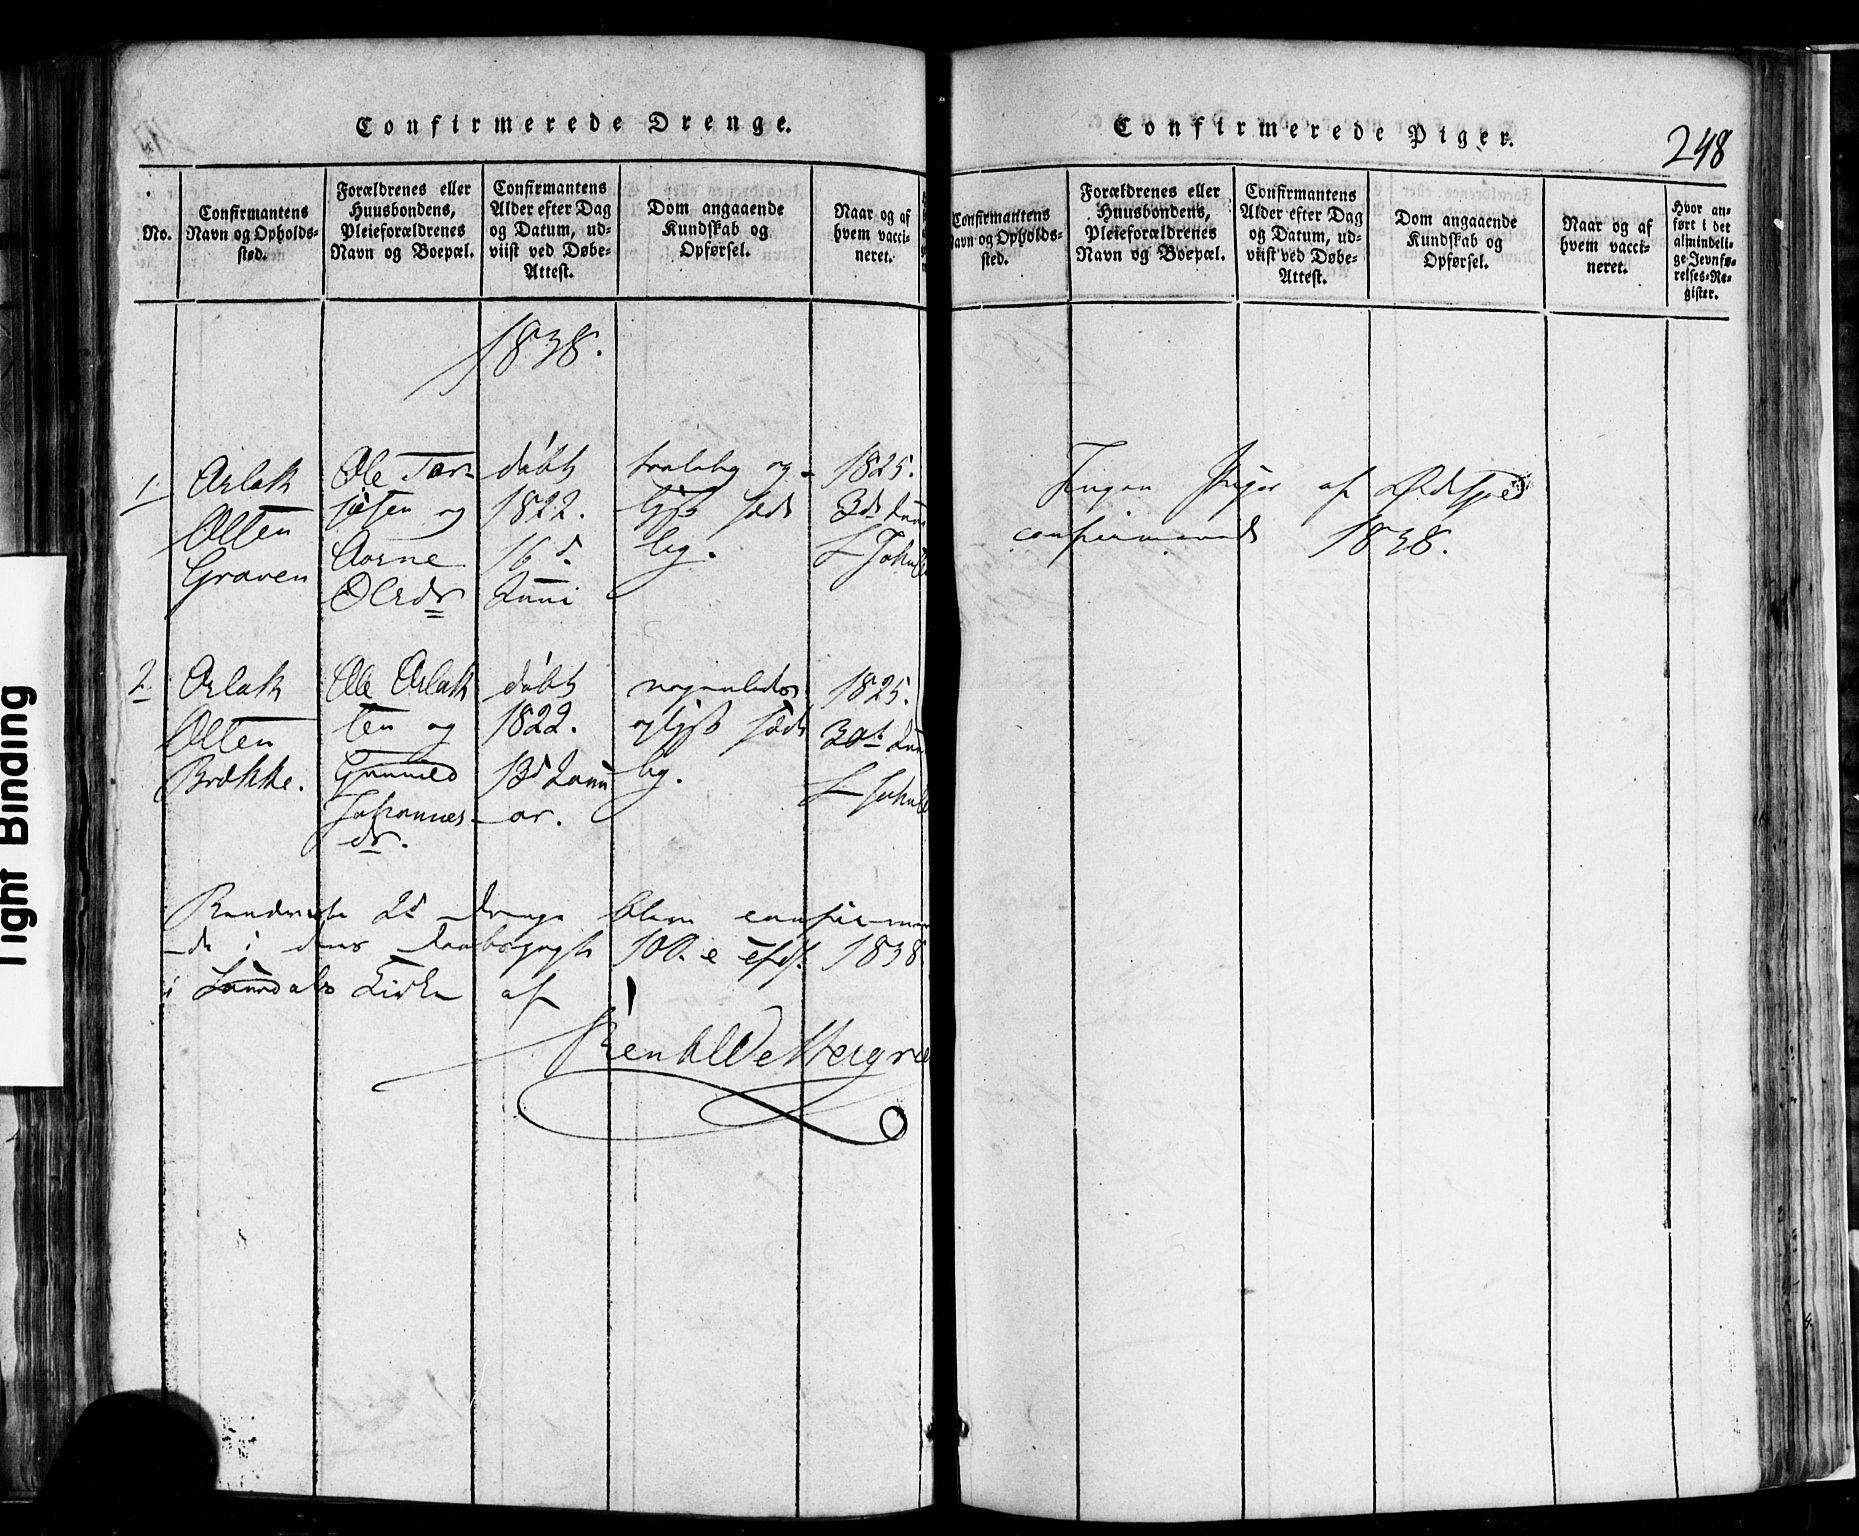 SAKO, Rauland kirkebøker, F/Fa/L0002: Ministerialbok nr. 2, 1815-1860, s. 248